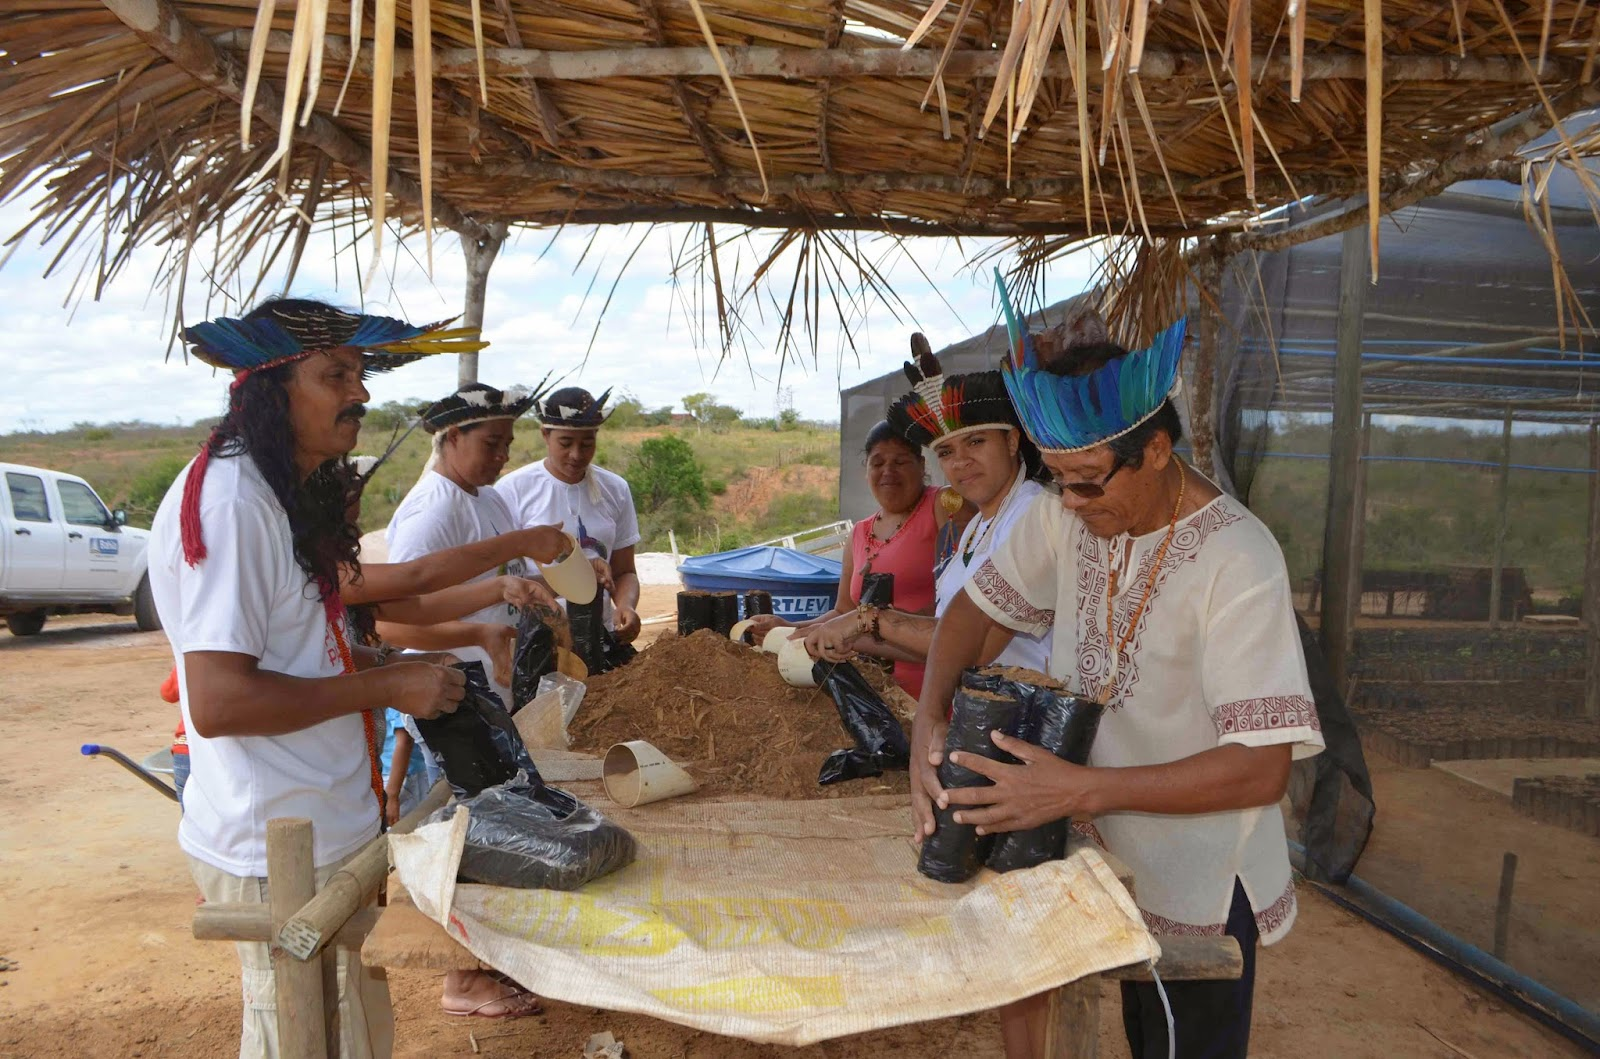 Governo reintegra, por meio da agricultura, tribo indígena Payaya na Bahia